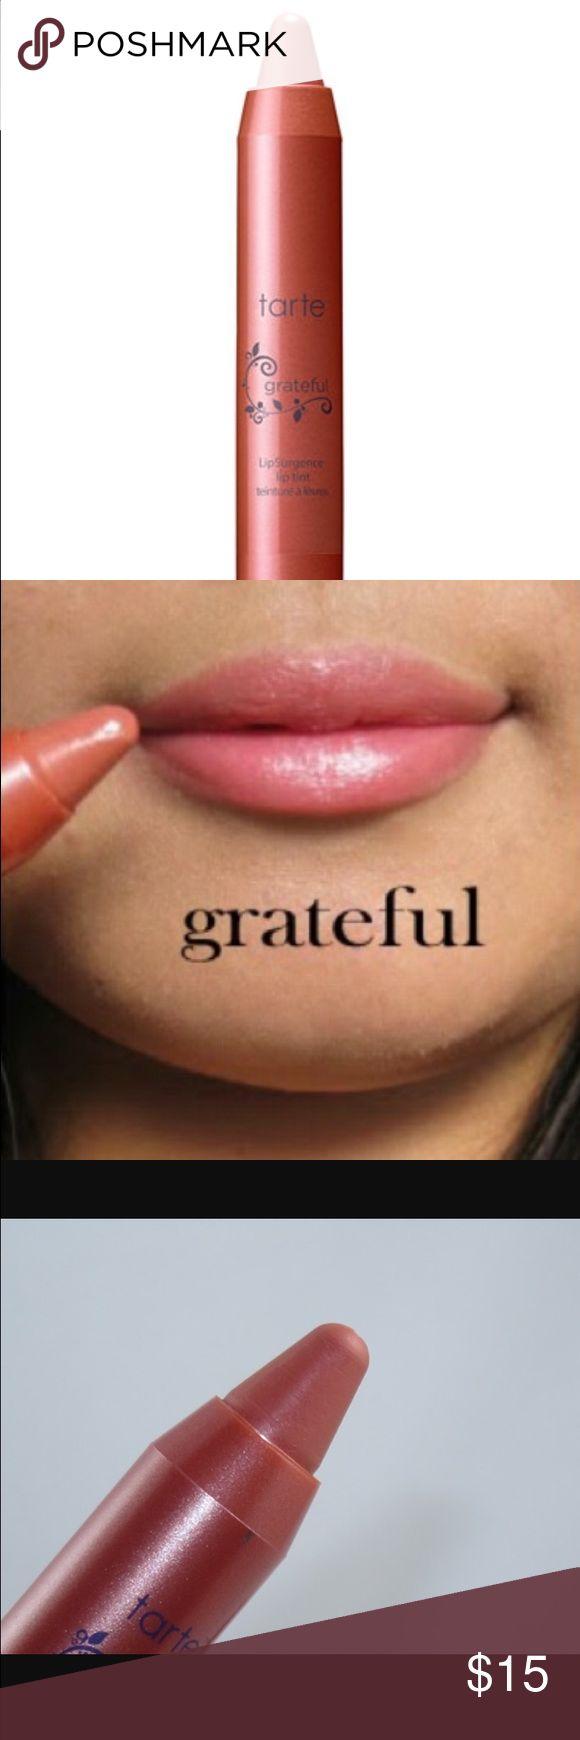 Tarte - LipSurgence lip tint - Grateful. Tarte - LipSurgence lip tint - Grateful. Unopened. 0.10oz. tarte Makeup Lipstick